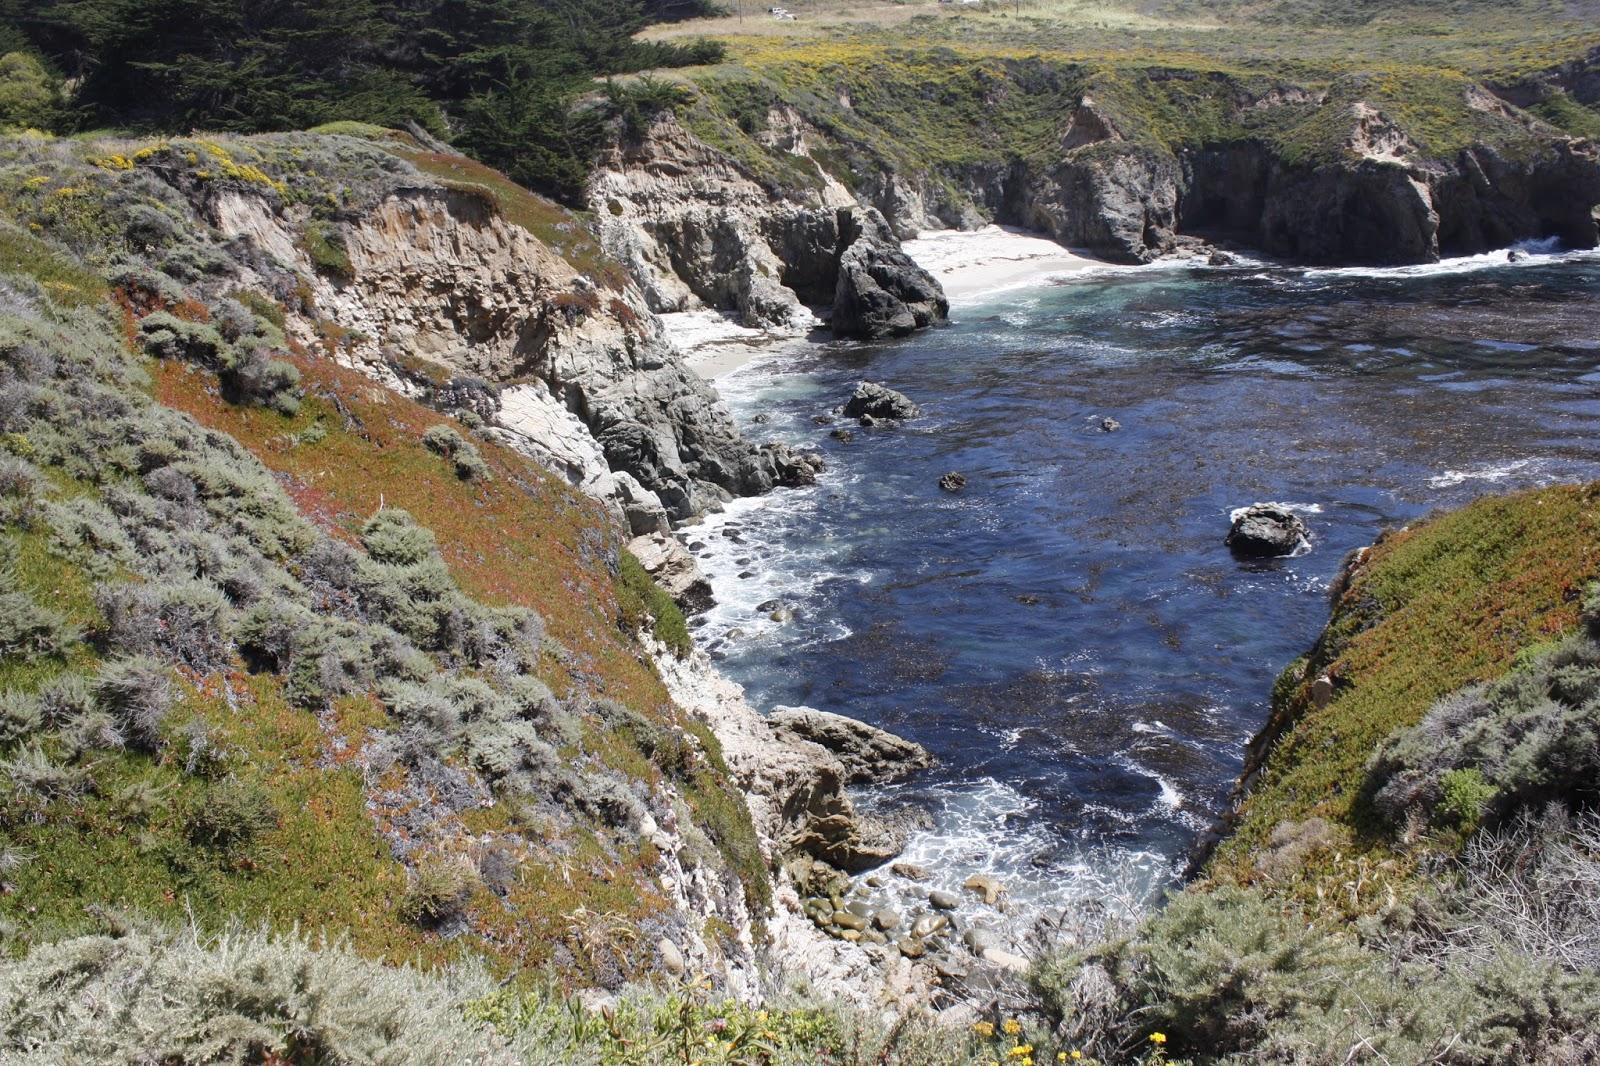 Dc scorpio blog ca sea otter state game refuge carmel ca for The refuge carmel